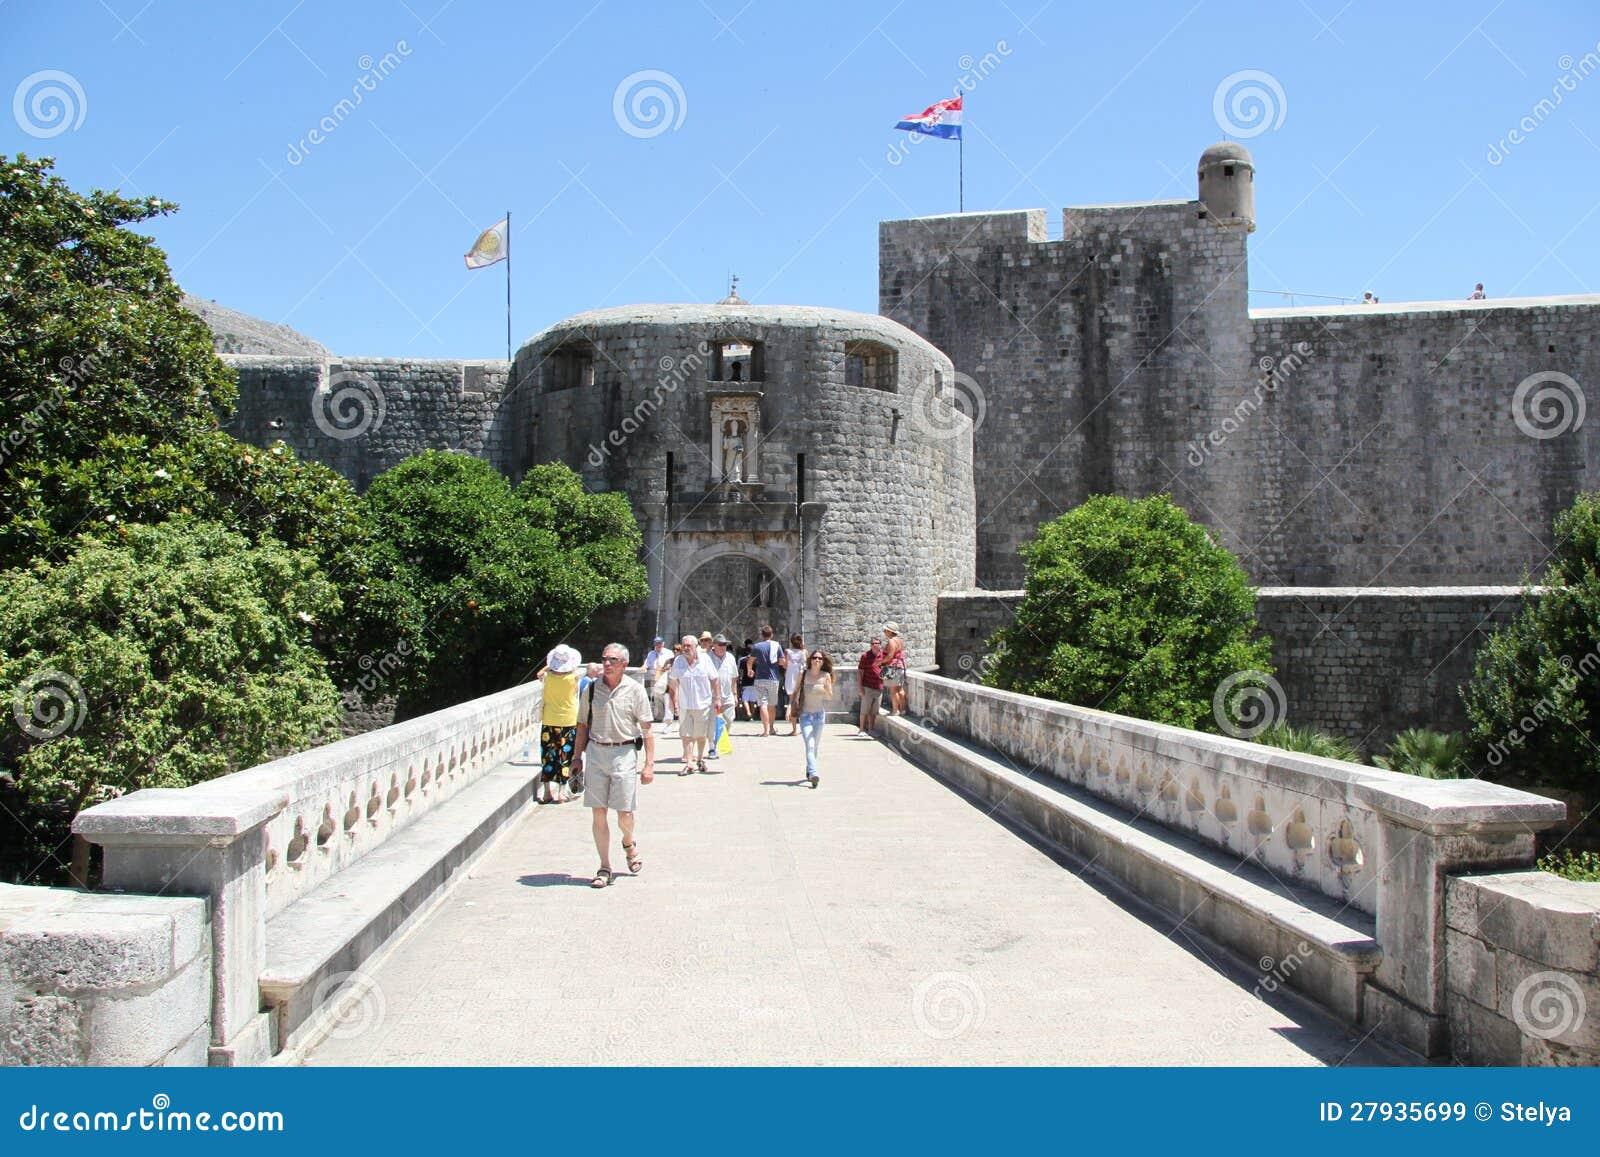 Ingang aan oude stad dubrovnik redactionele stock afbeelding beeld 27935699 - Muur van de ingang ...